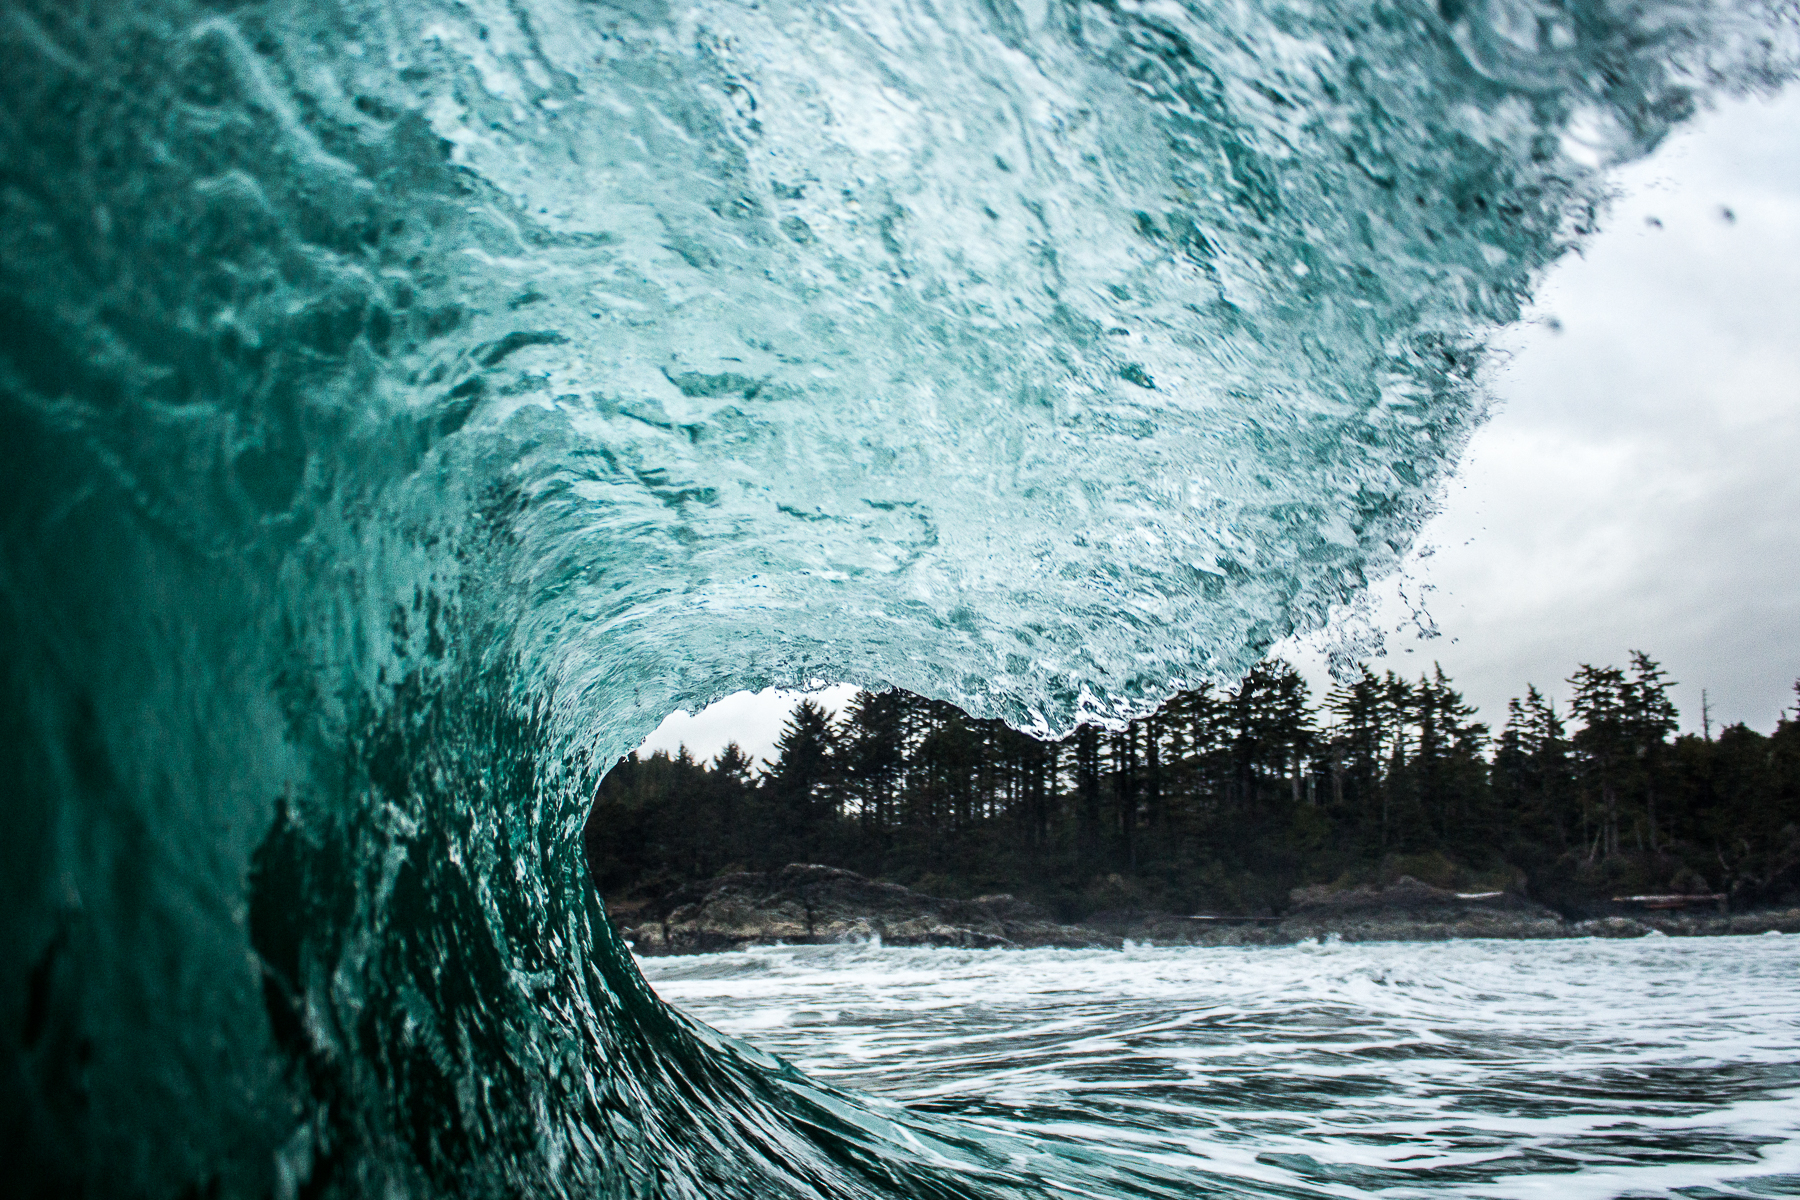 tofino_surf_photography-Left-vision-blue-2017.jpg